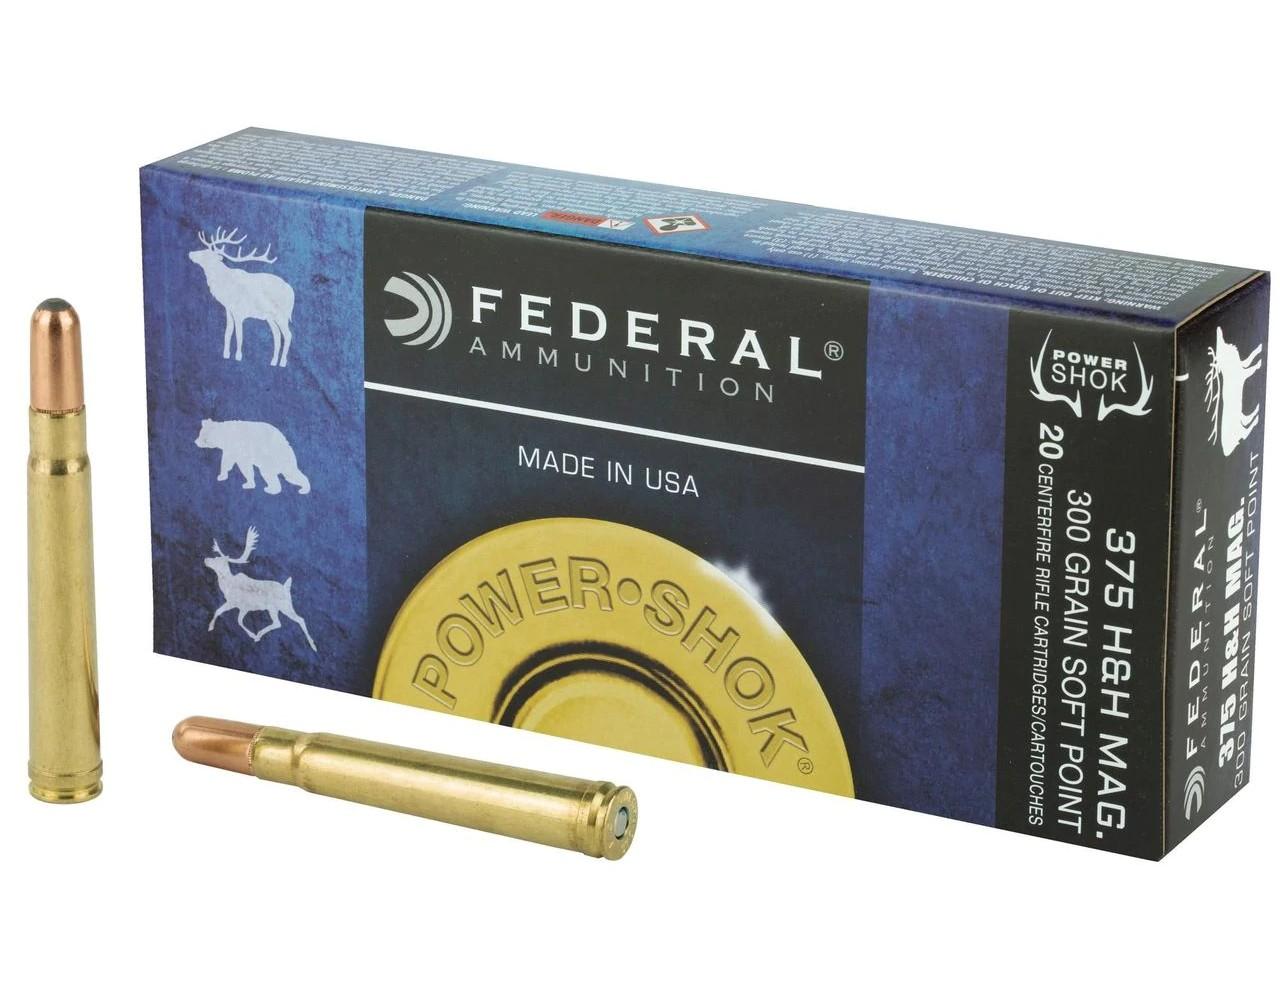 Boite de 20 cartouches FEDERAL SP calibre 375 HH 300 GRS F375B